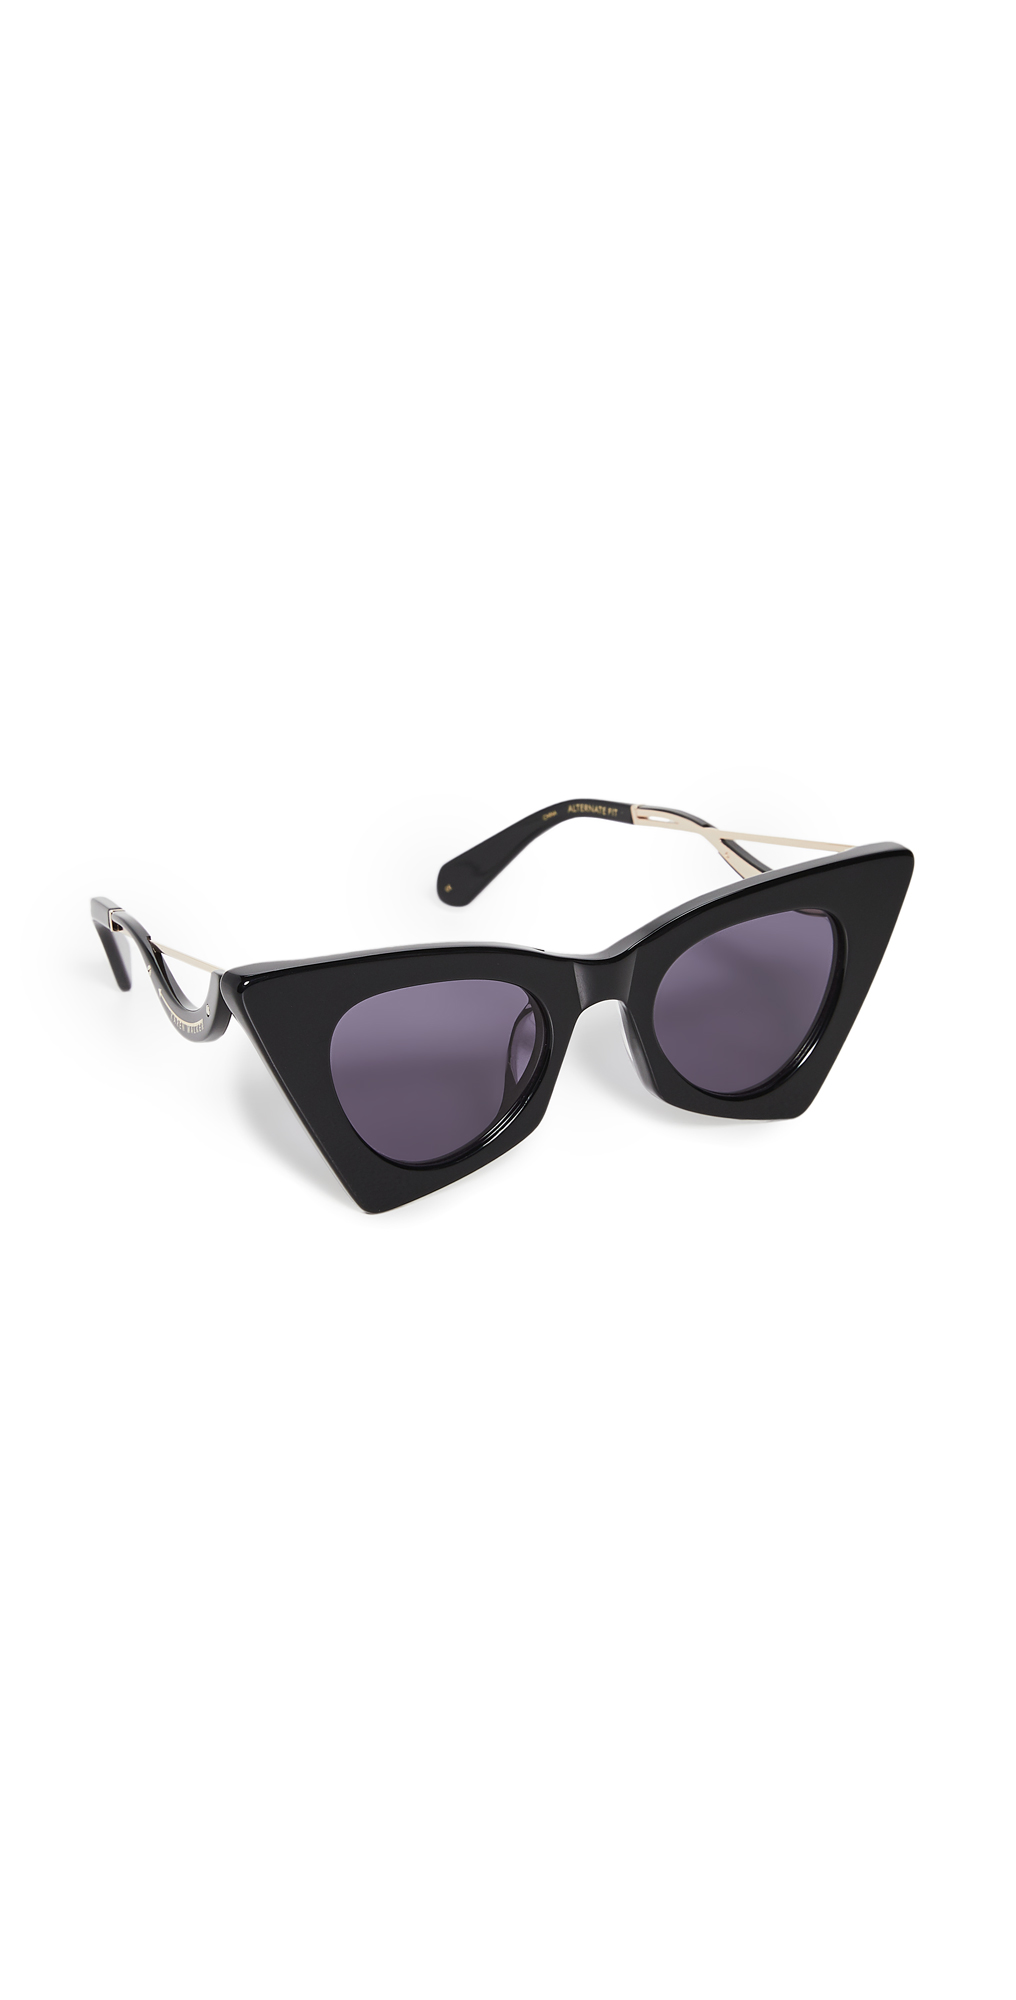 Astral Heart Sunglasses